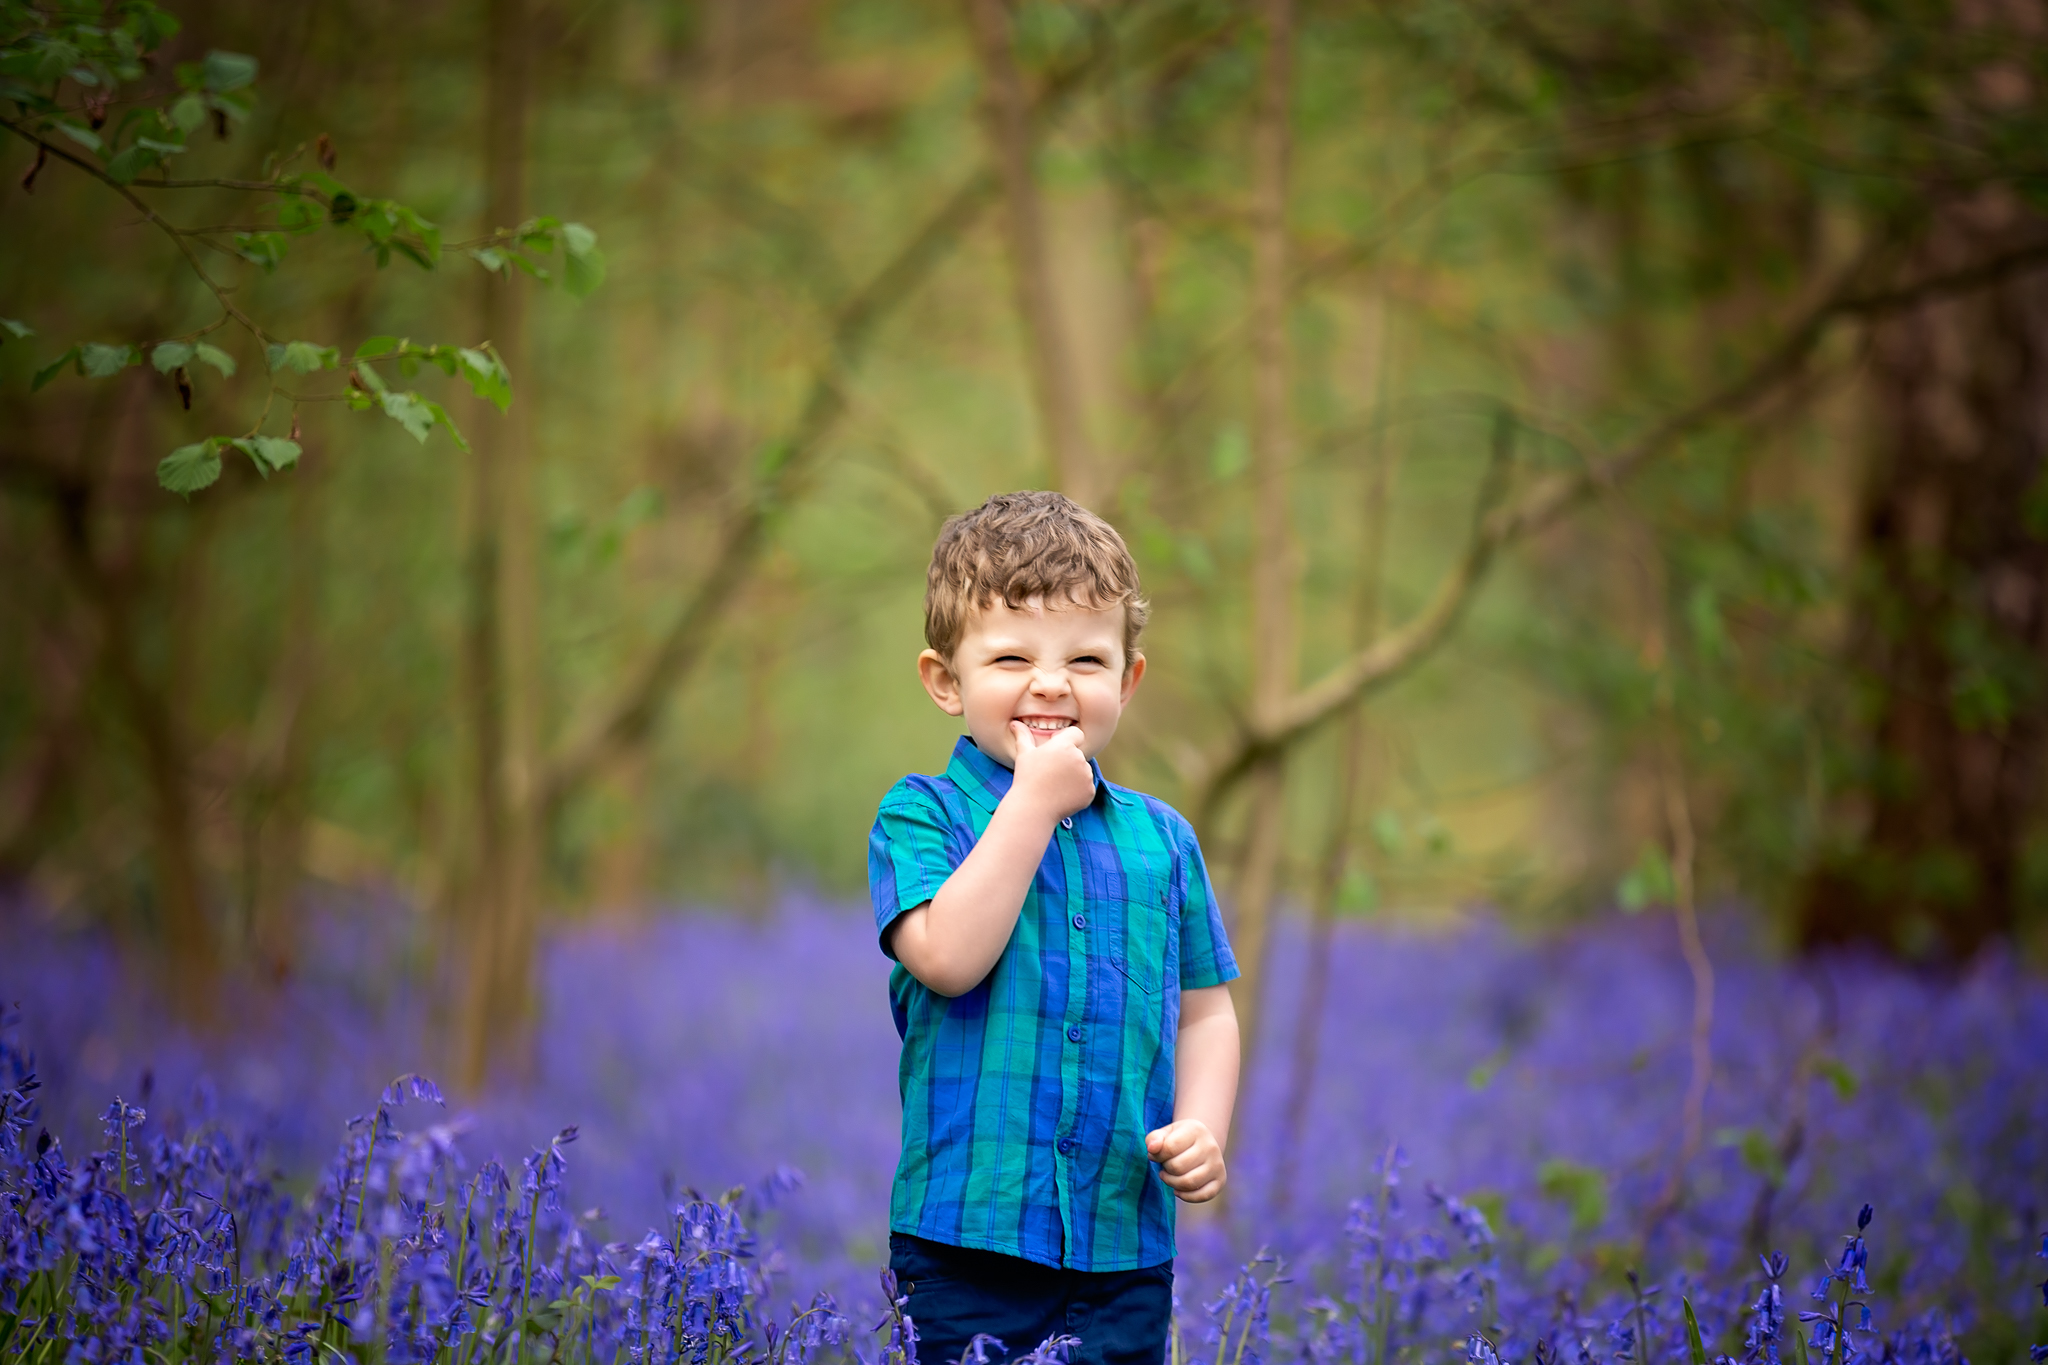 Child photographer Leeds, York, Harrogare, Bradford: cute little boy during bluebell session in Leeds, West Yorkshire